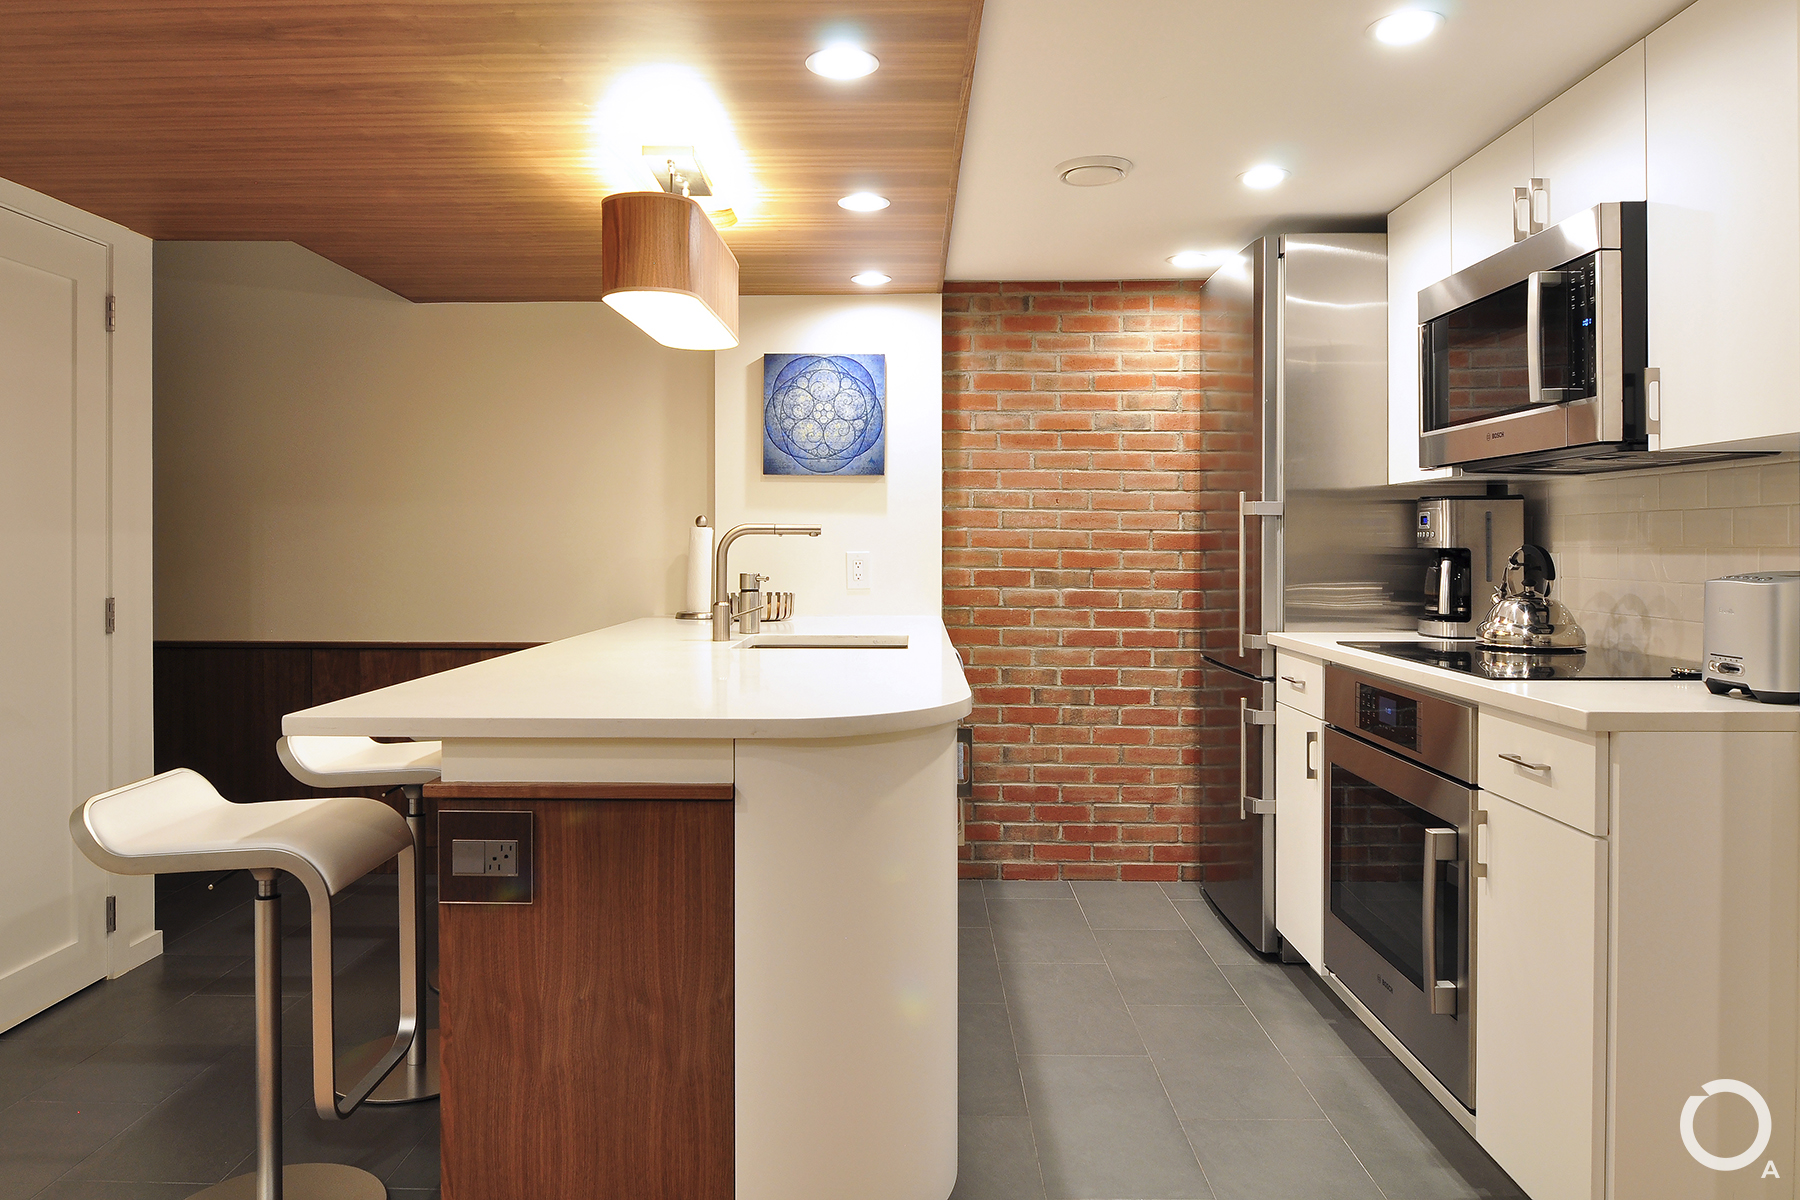 B1 (south end condo renovation boston architect interior designer).jpg